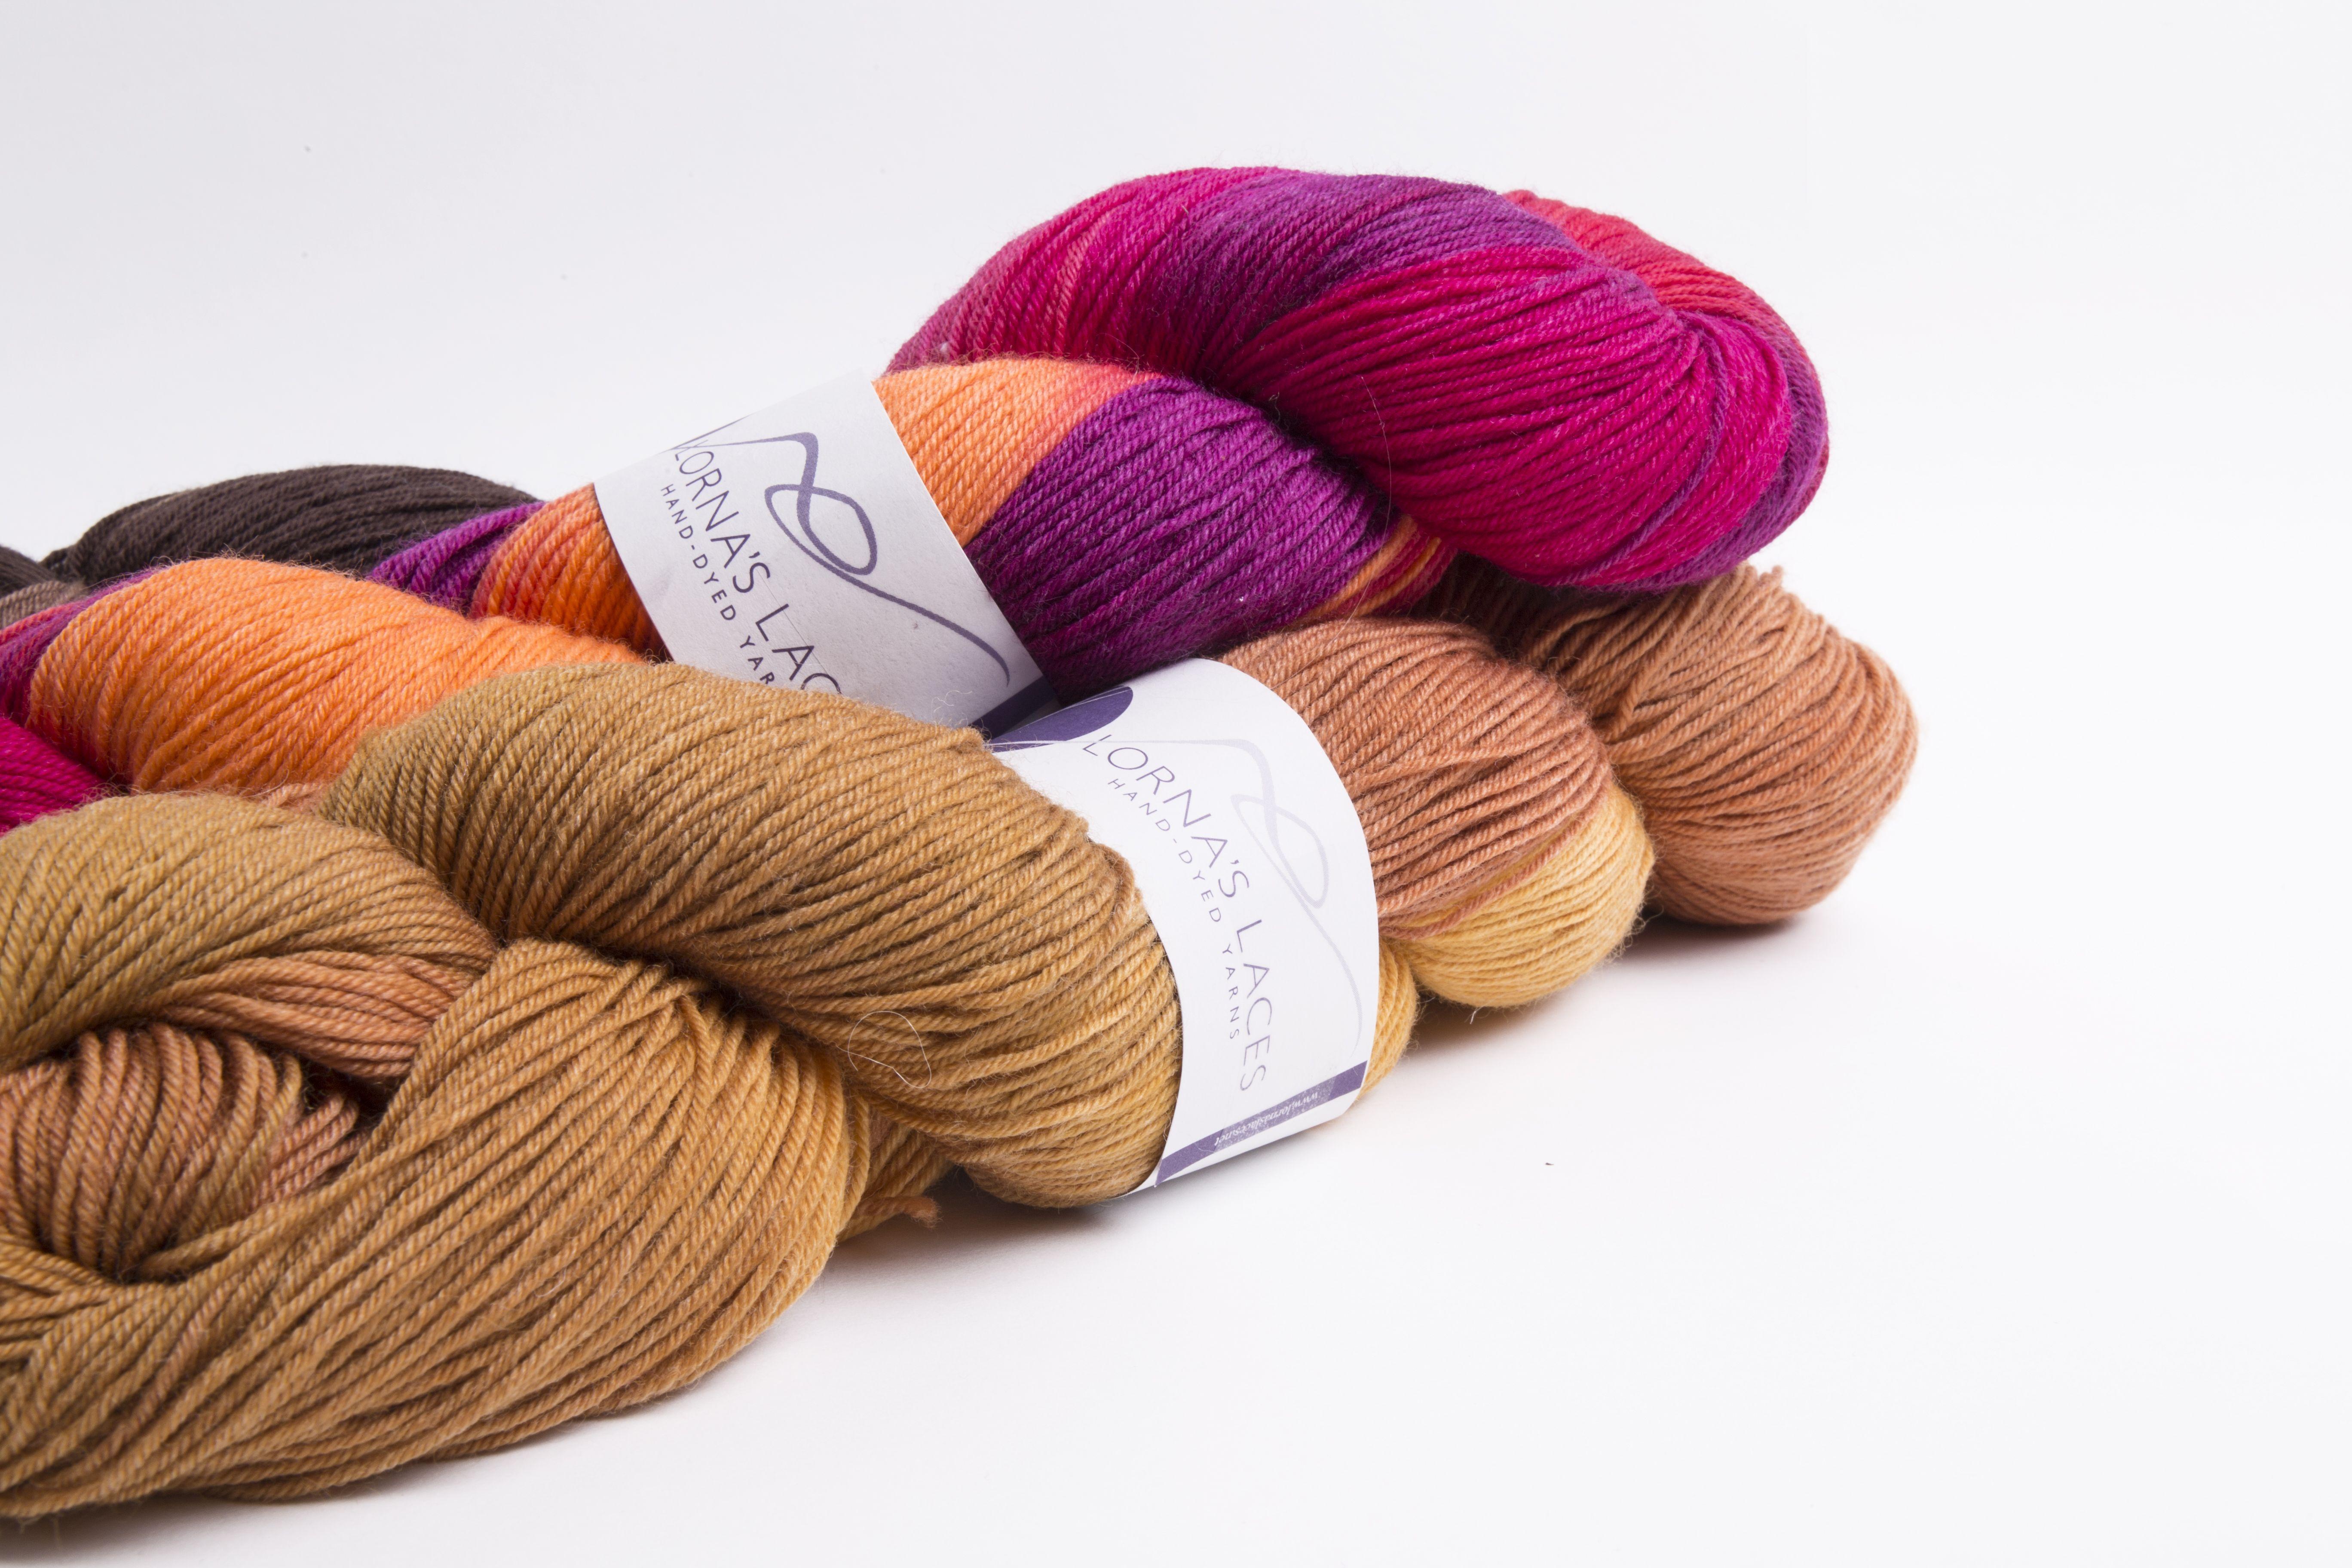 Lorna\'s Lace Shepherd Sock   Artisan Yarn - Deramores   Pinterest ...